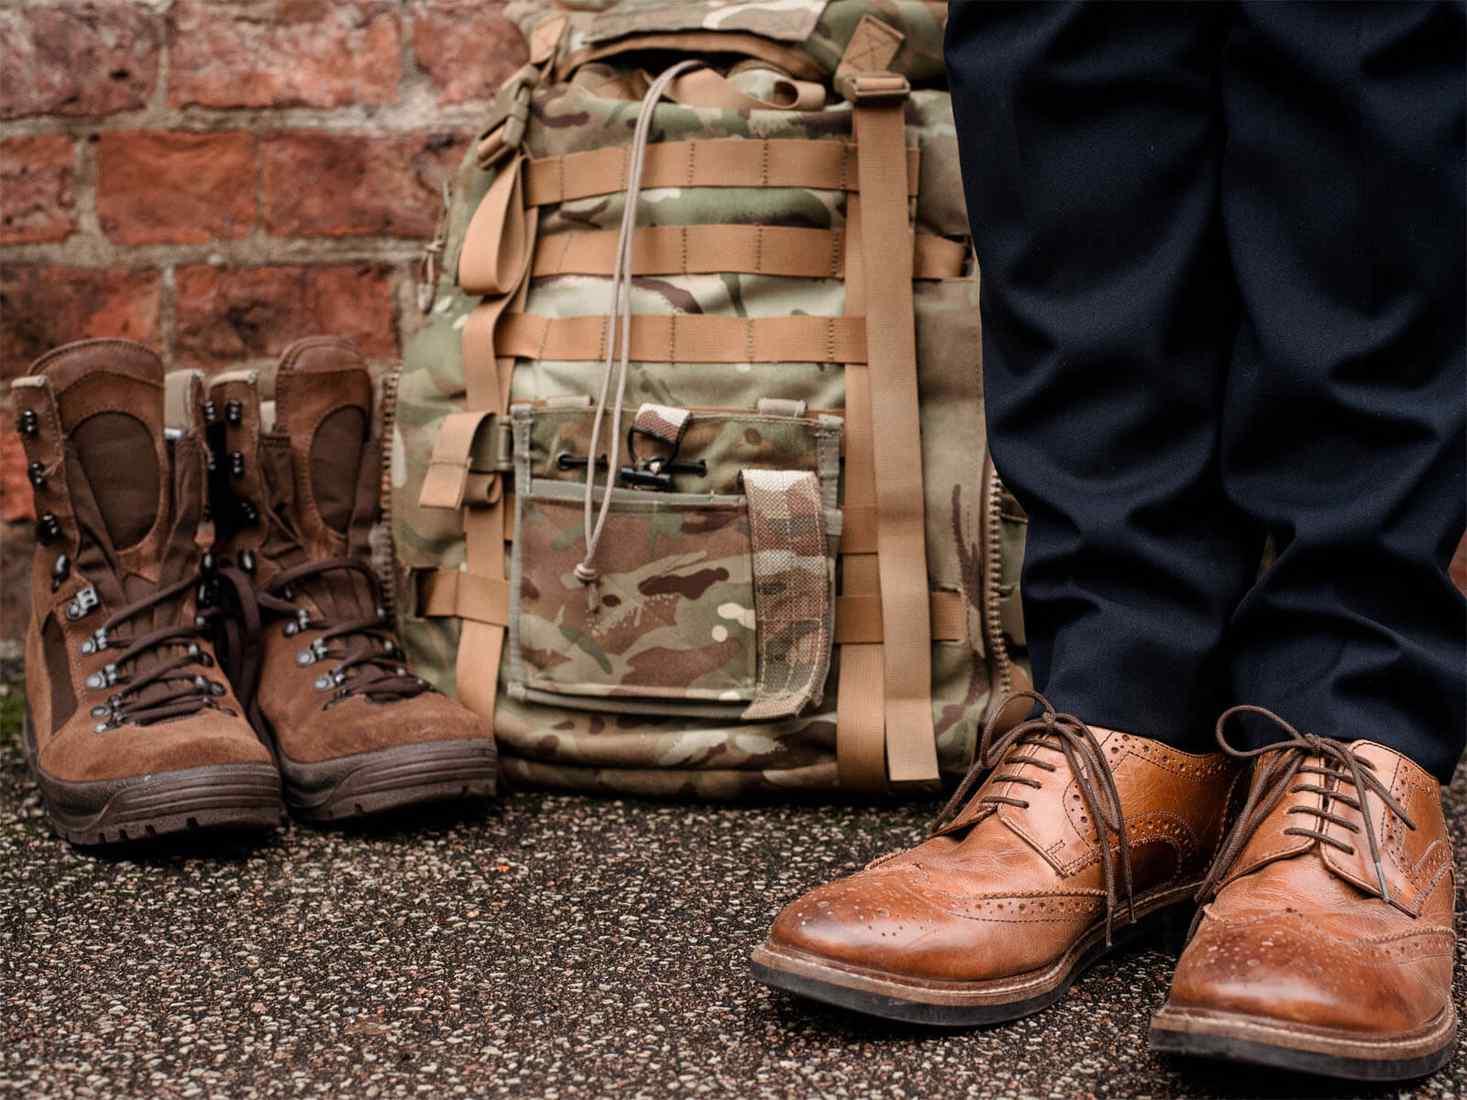 Man's shoes next to bag